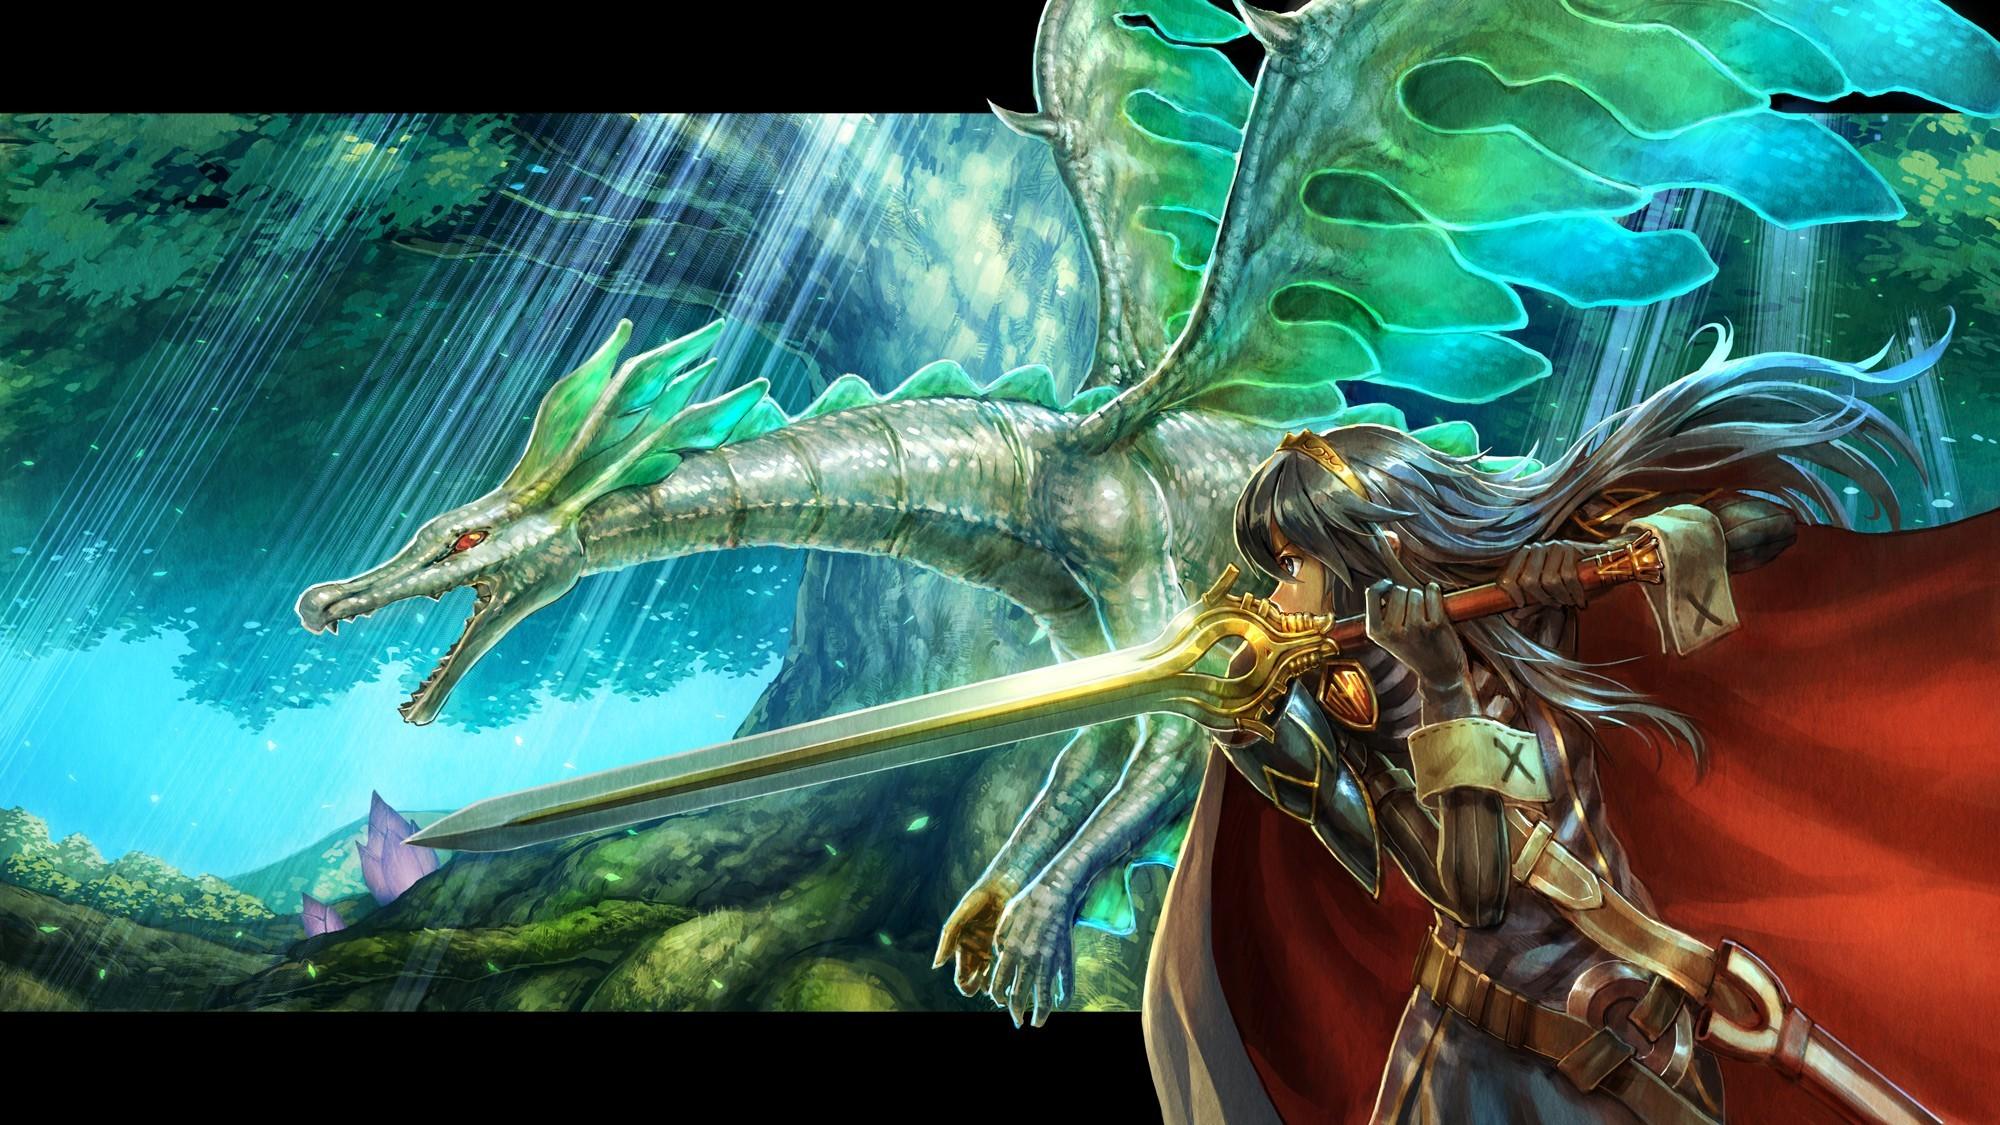 Fire Emblem Desktop Wallpaper: Shadow Dragon Wallpaper (60+ Images